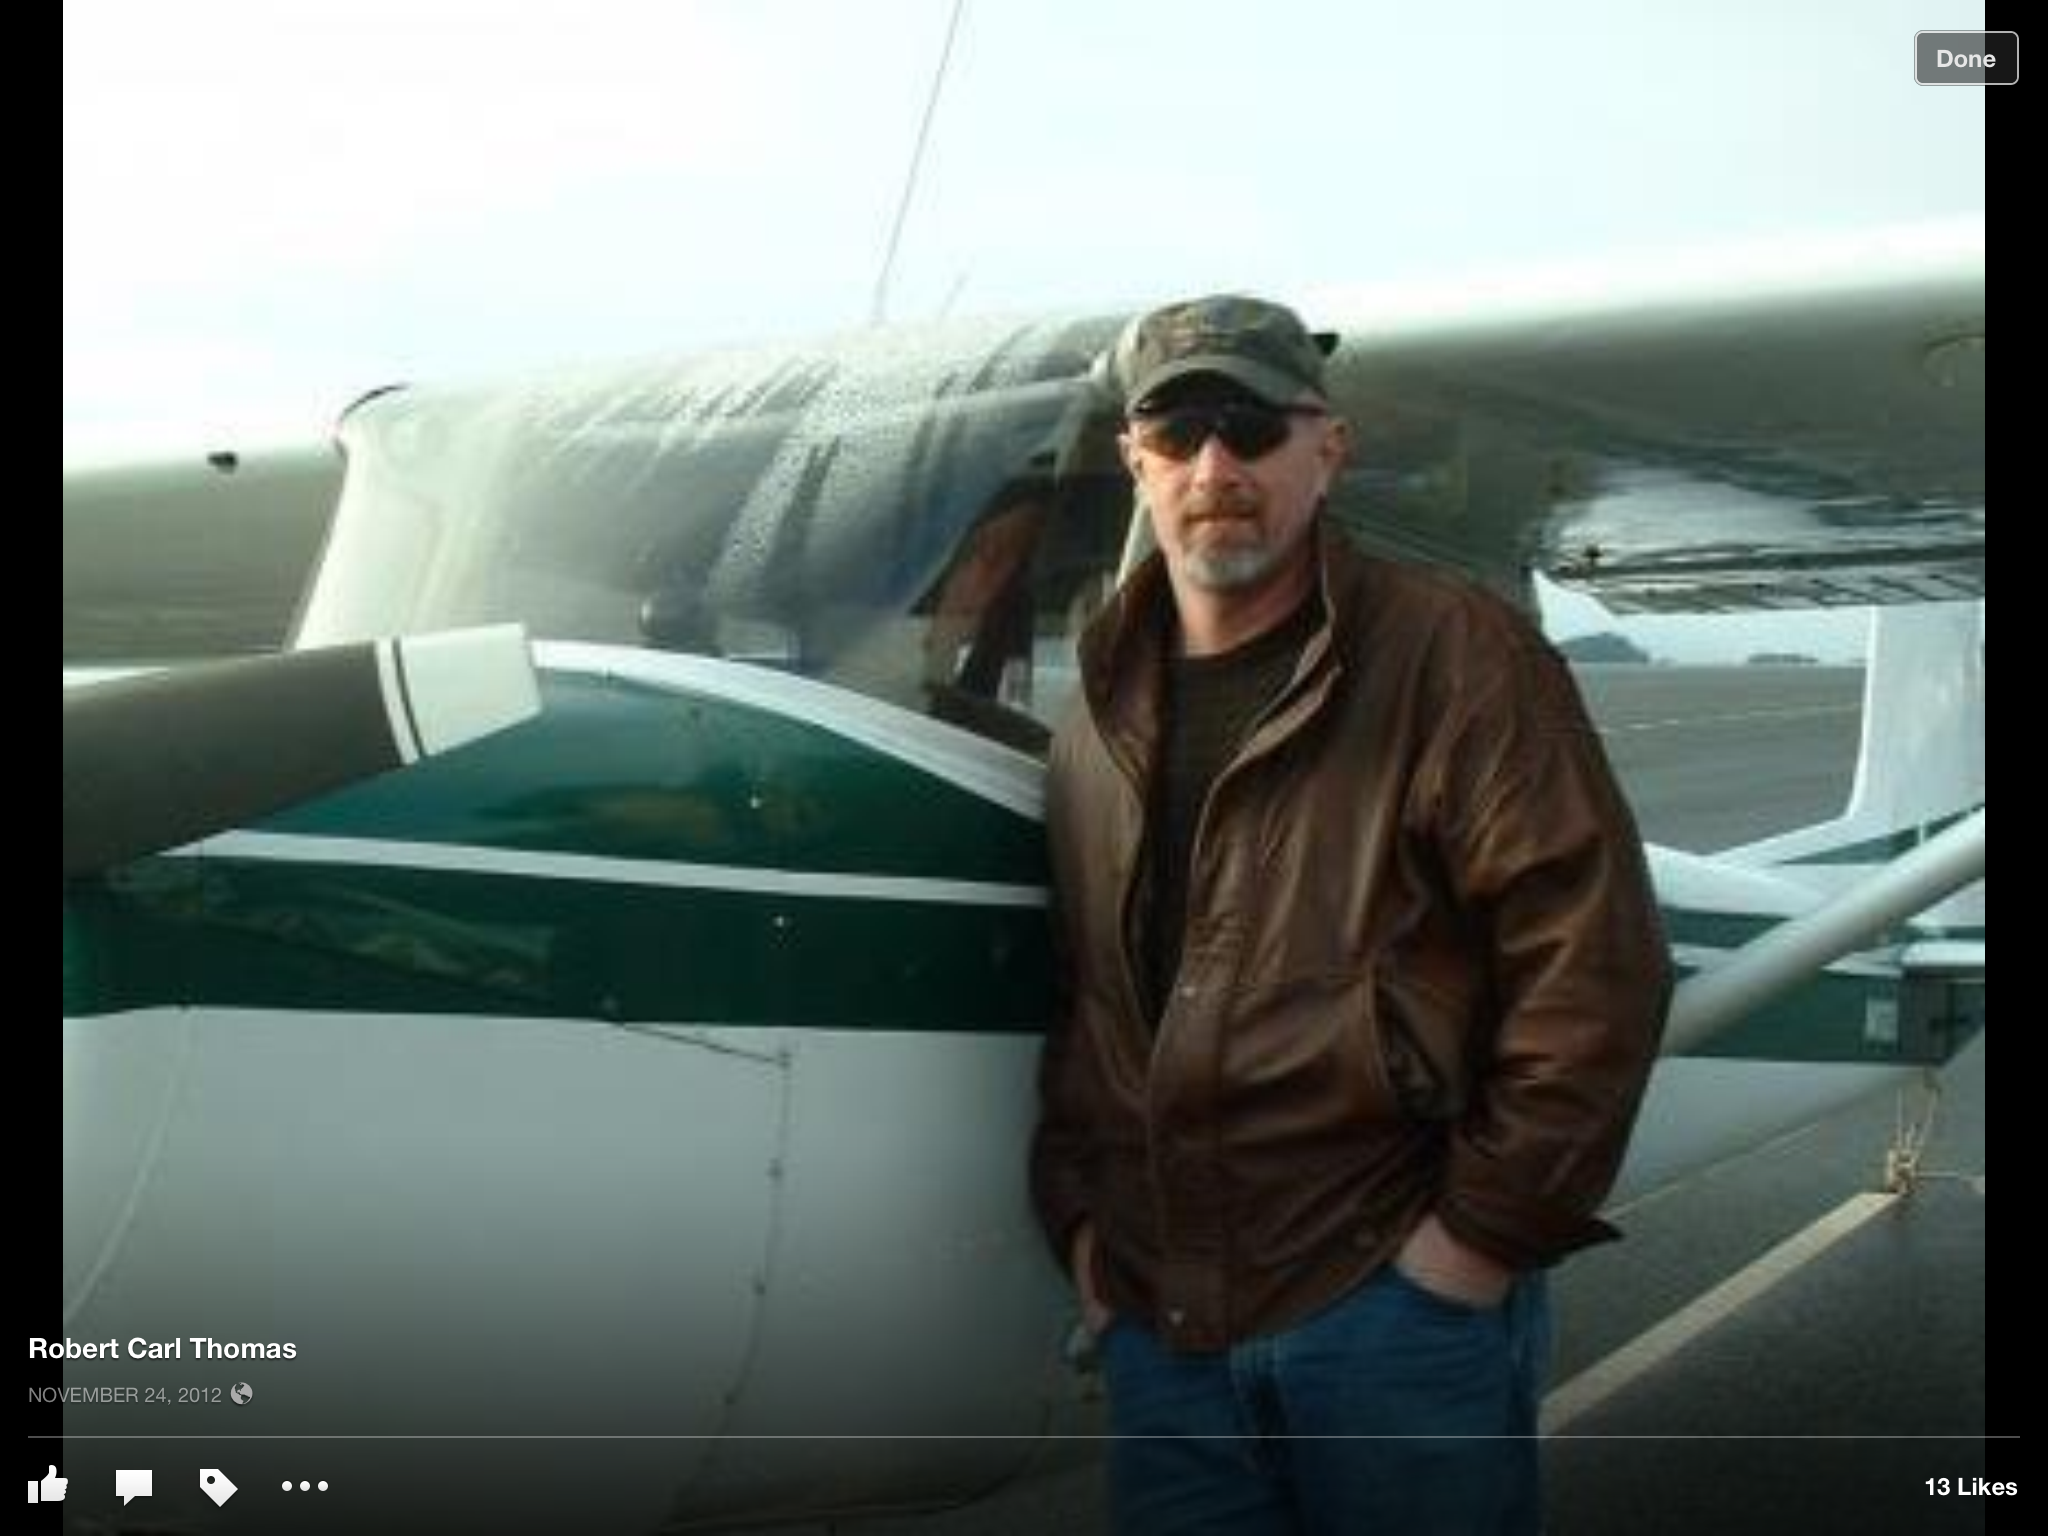 ATP Medicine Aviation Thomas Physicals